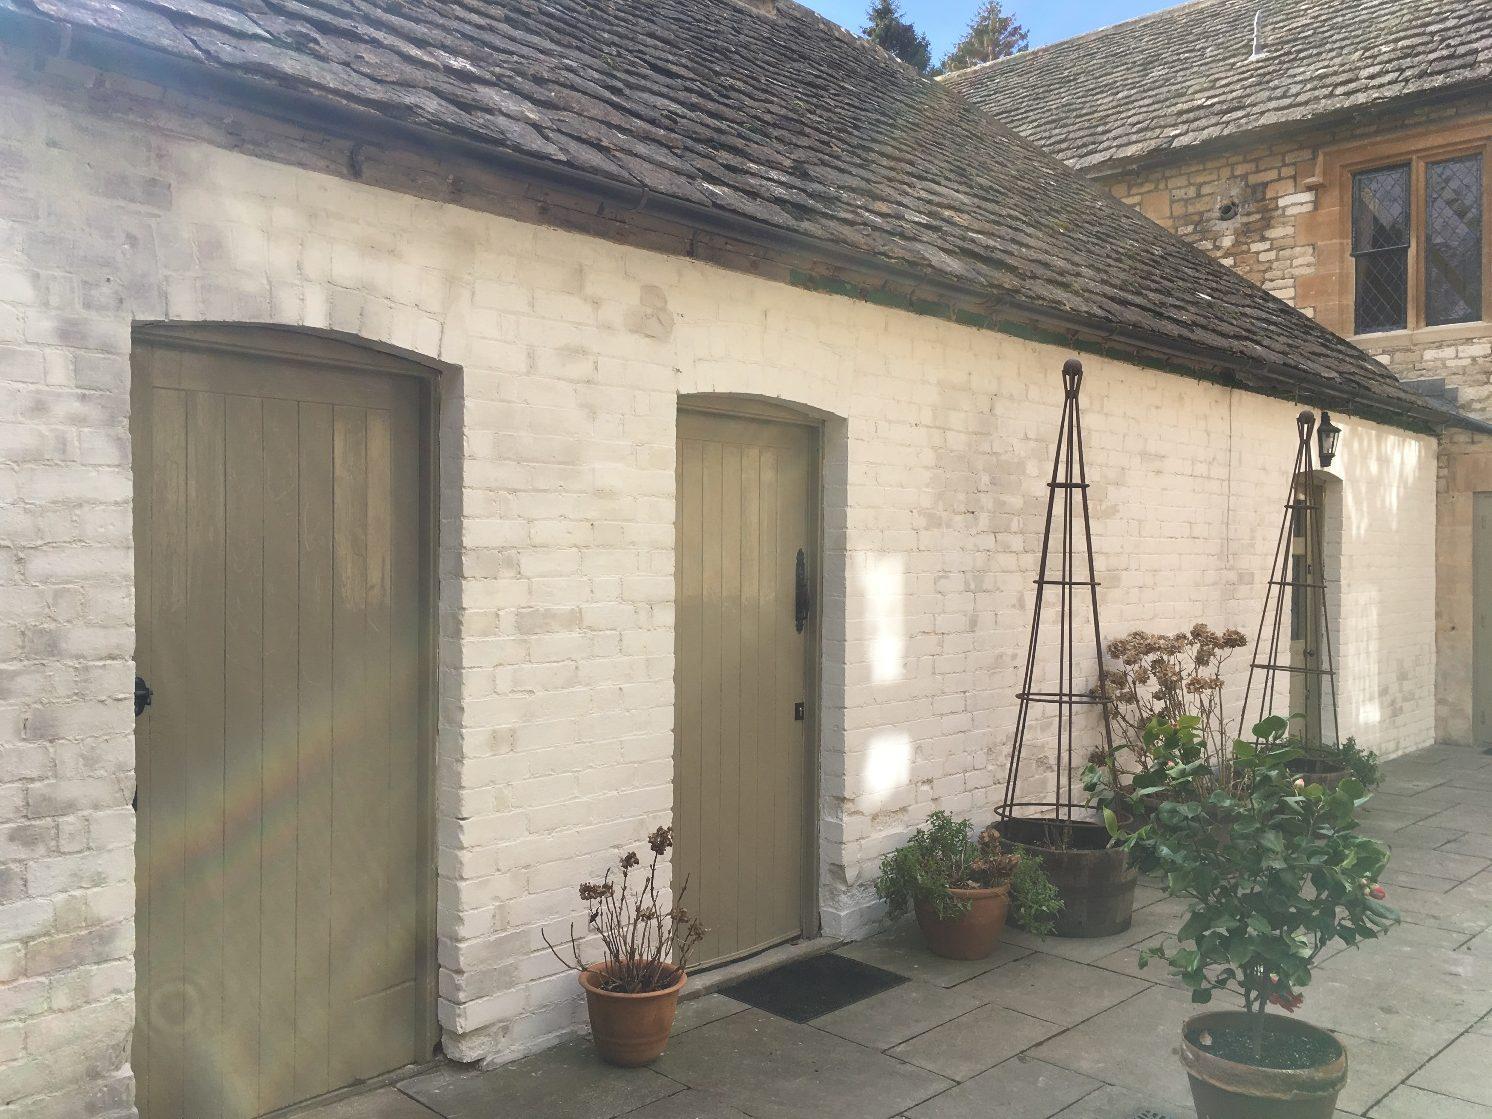 Brick kitchen during refurbishment